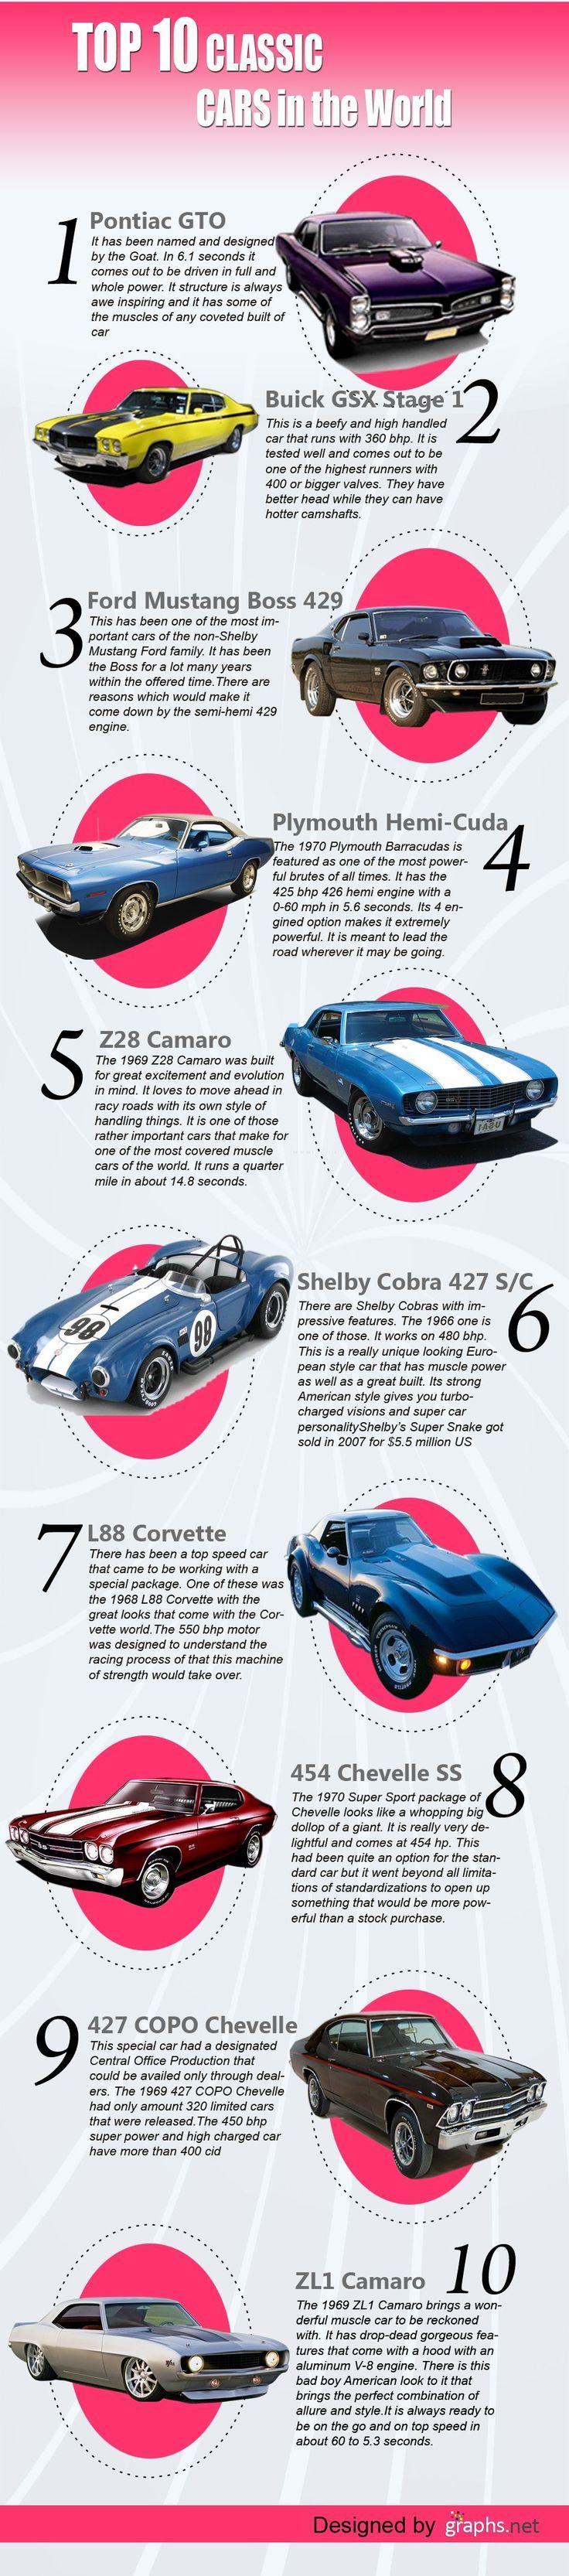 330 best images about Car Art on Pinterest